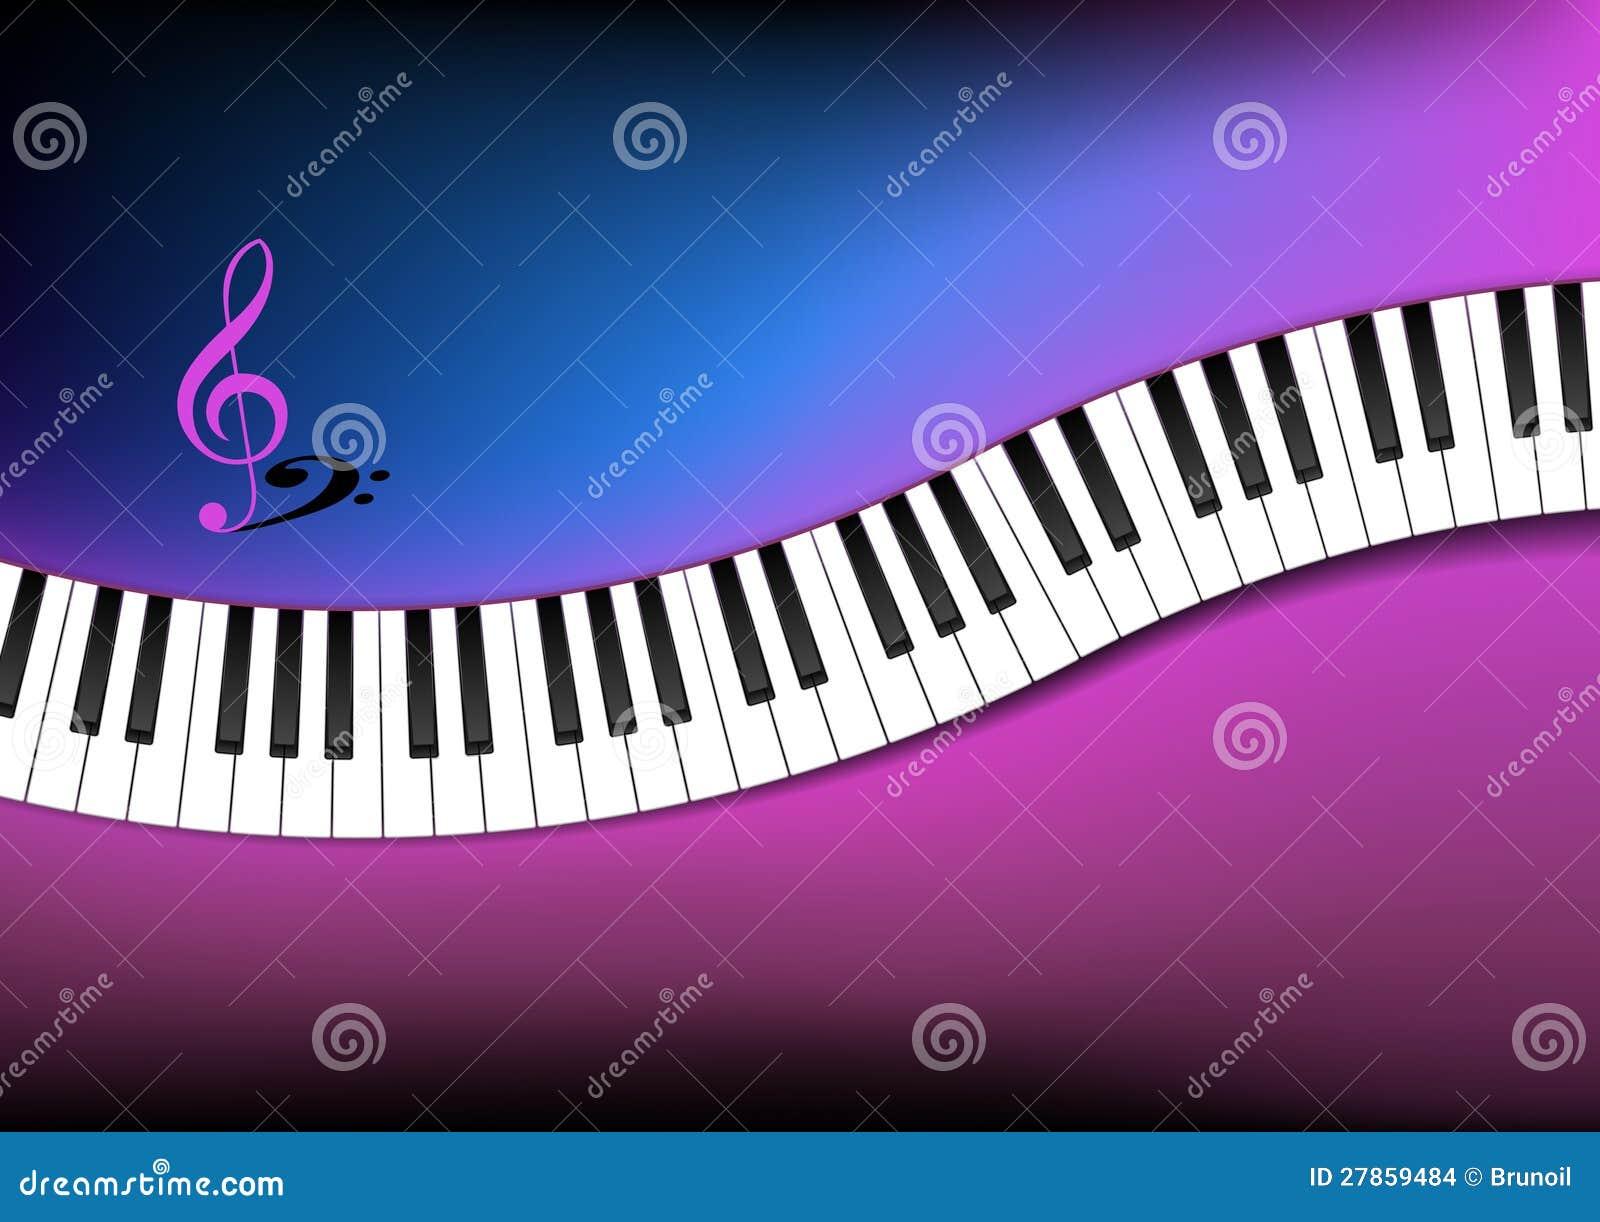 Fundo azul e cor de rosa teclado de piano curvado imagens for Imagenes de techados